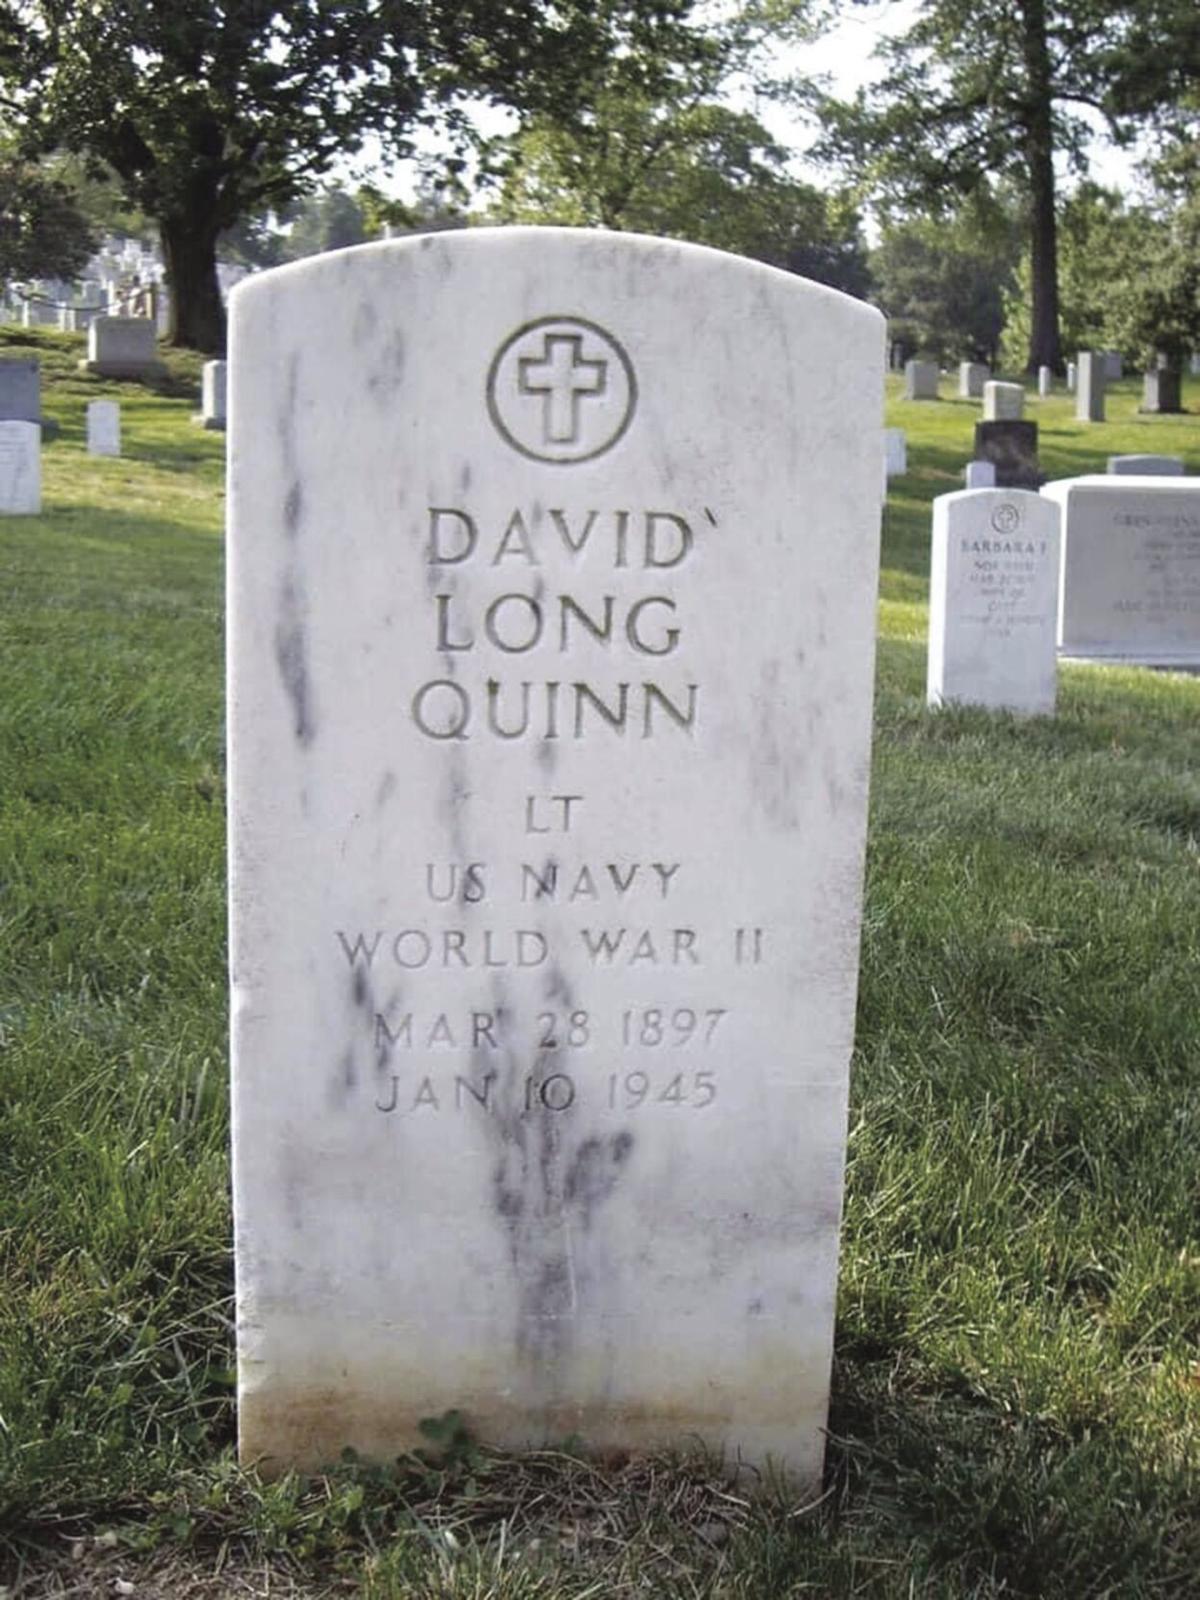 Quinn's marker